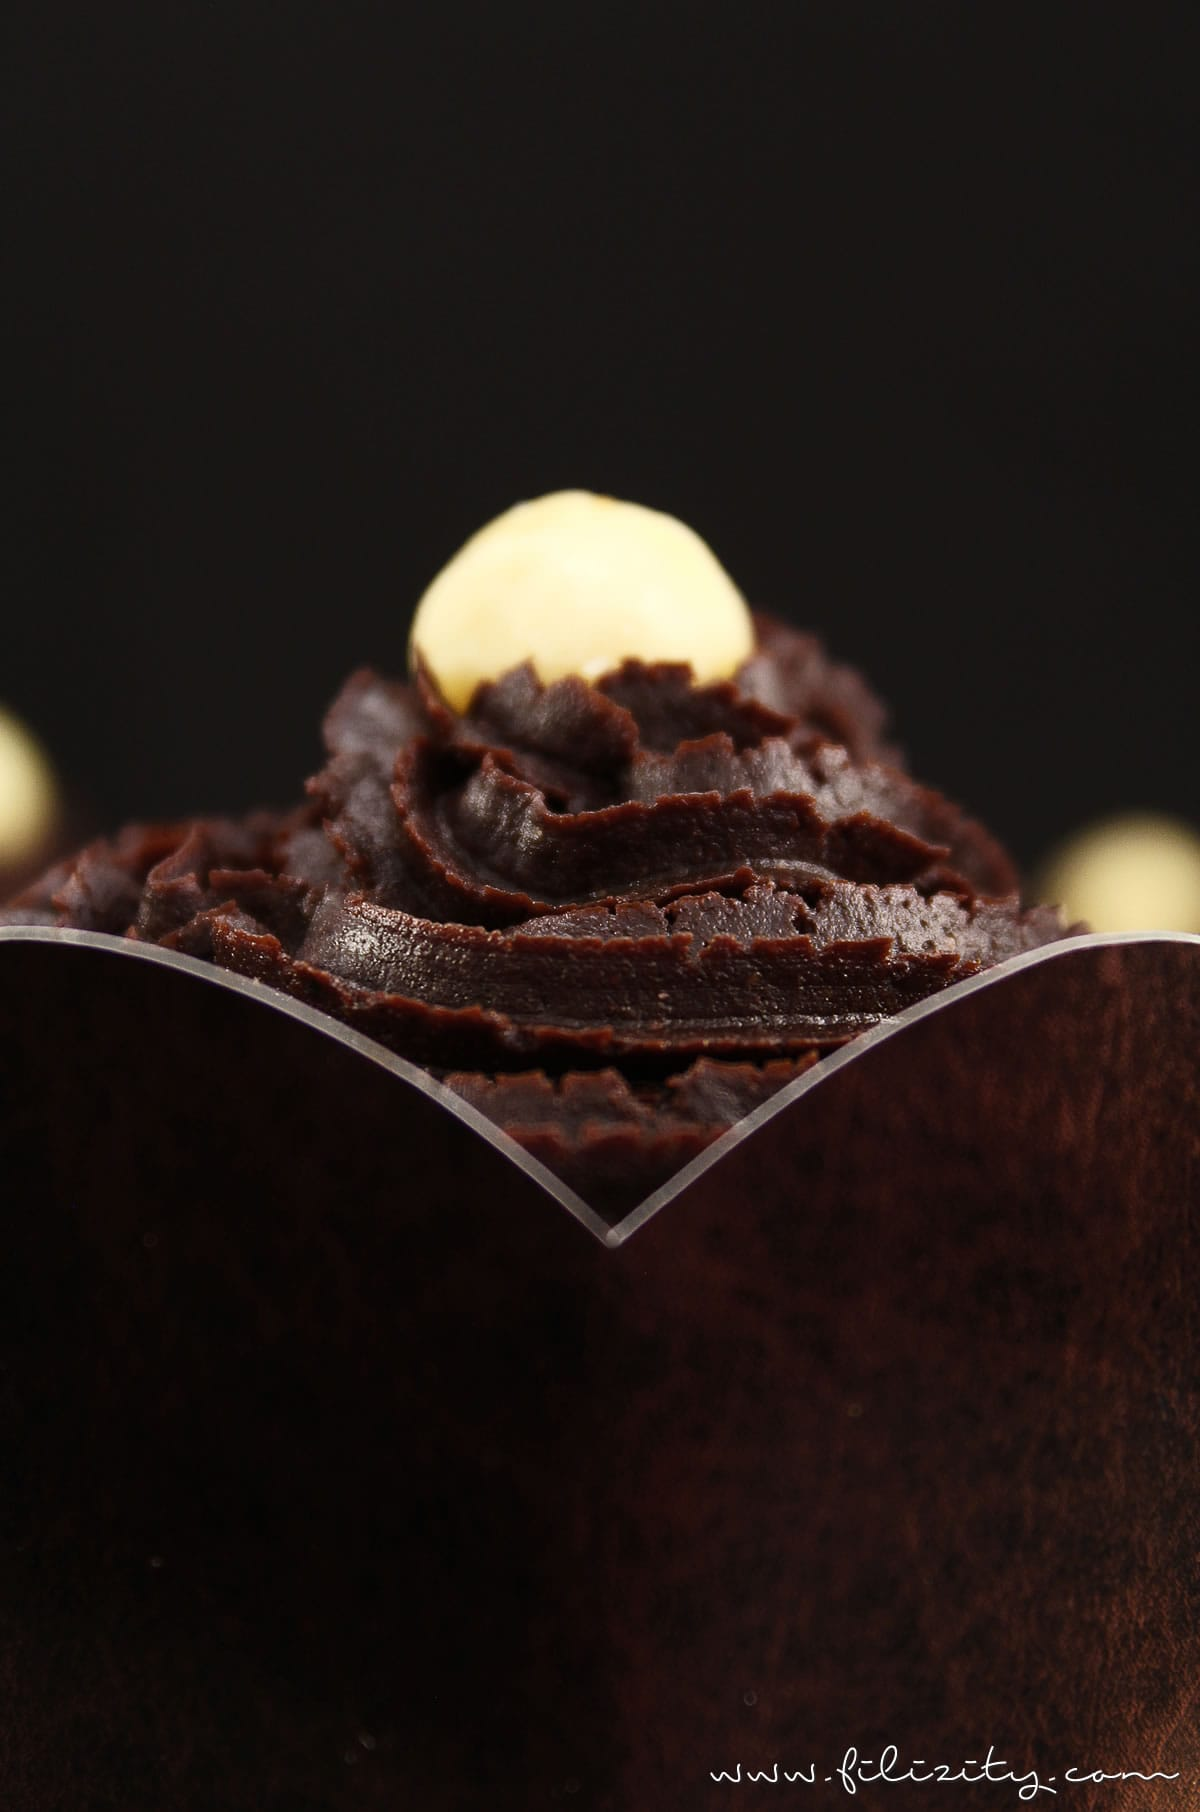 Rezept: Vegane Schoko-Macadamia-Muffins mit ChocQlate-Frosting